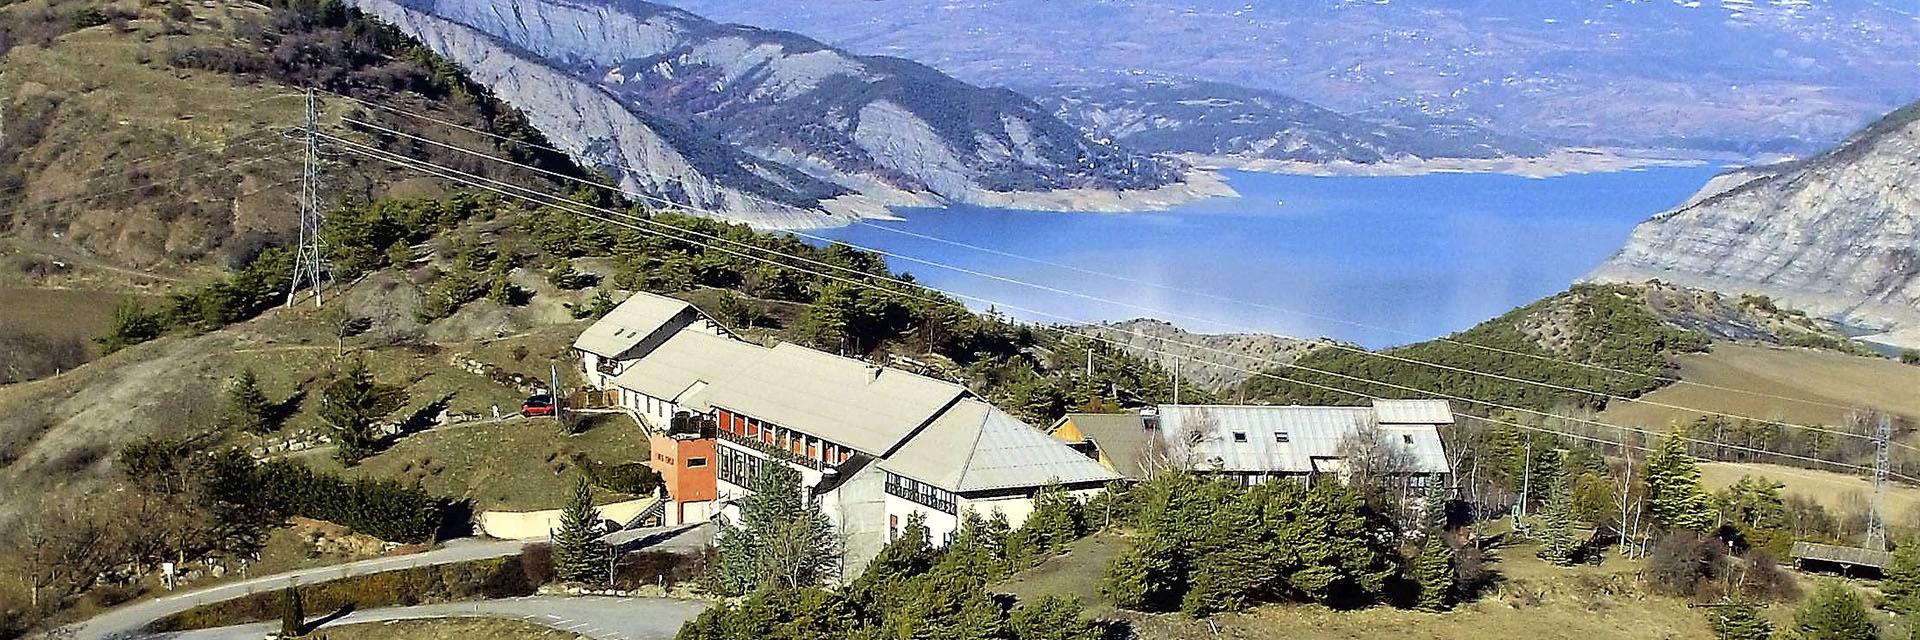 Rando en Alpes provençales ! - Rechastel